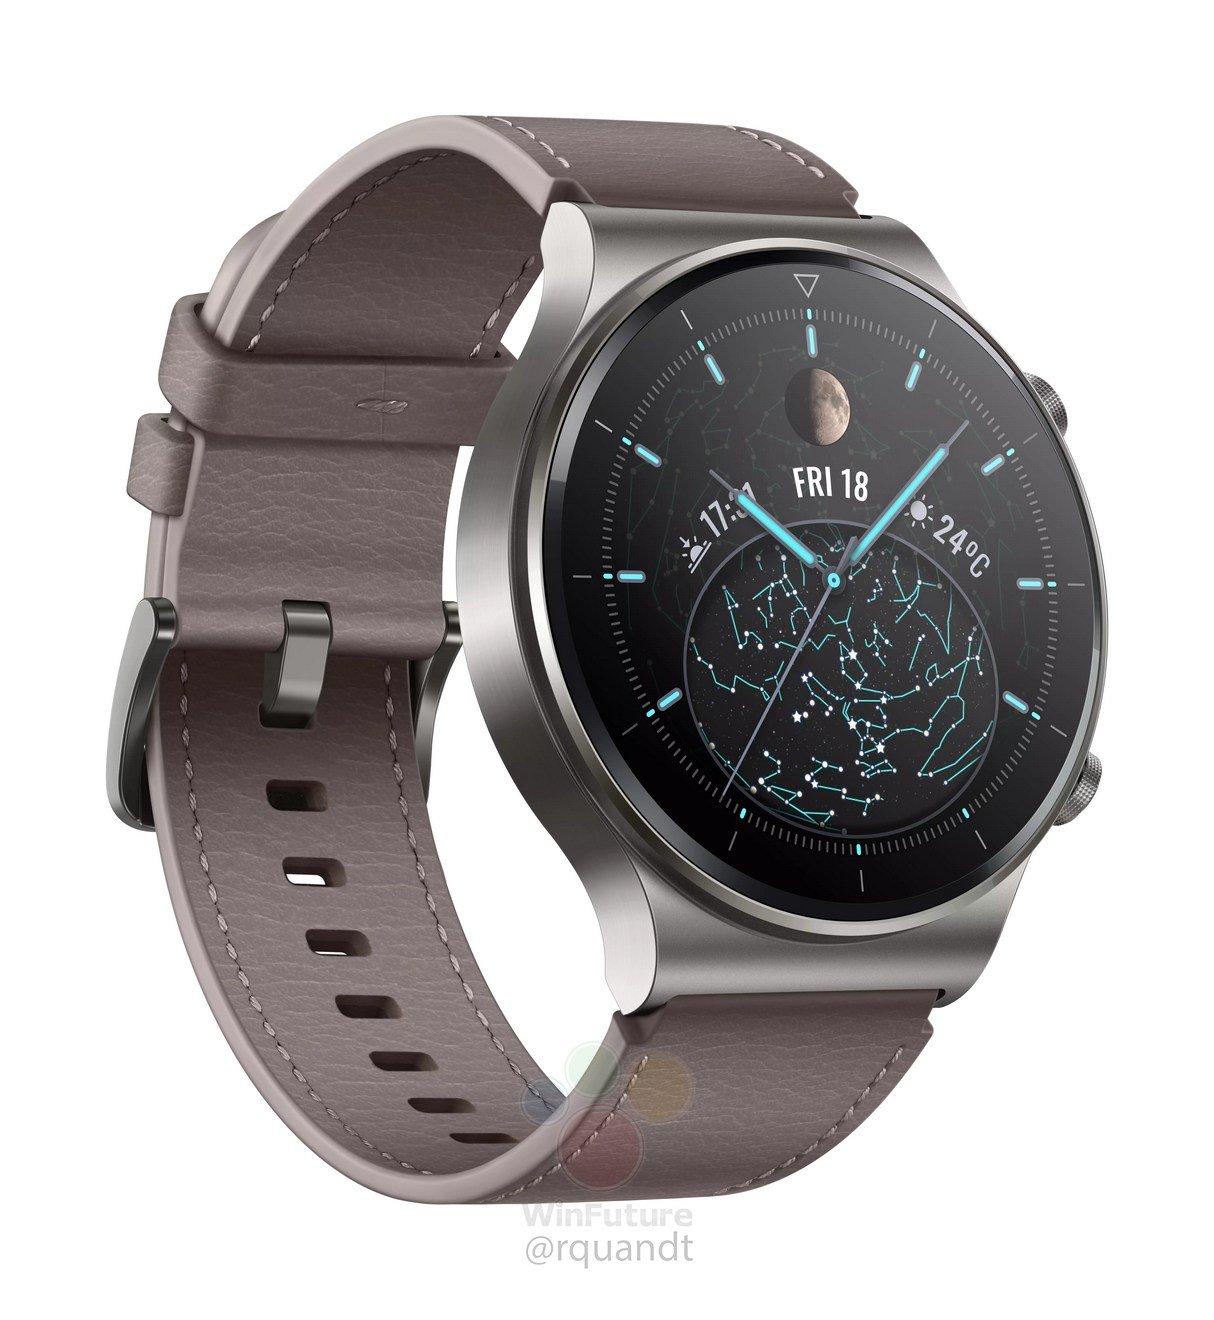 Huawei Watch GT2 Pro 1599138592 0 0 large